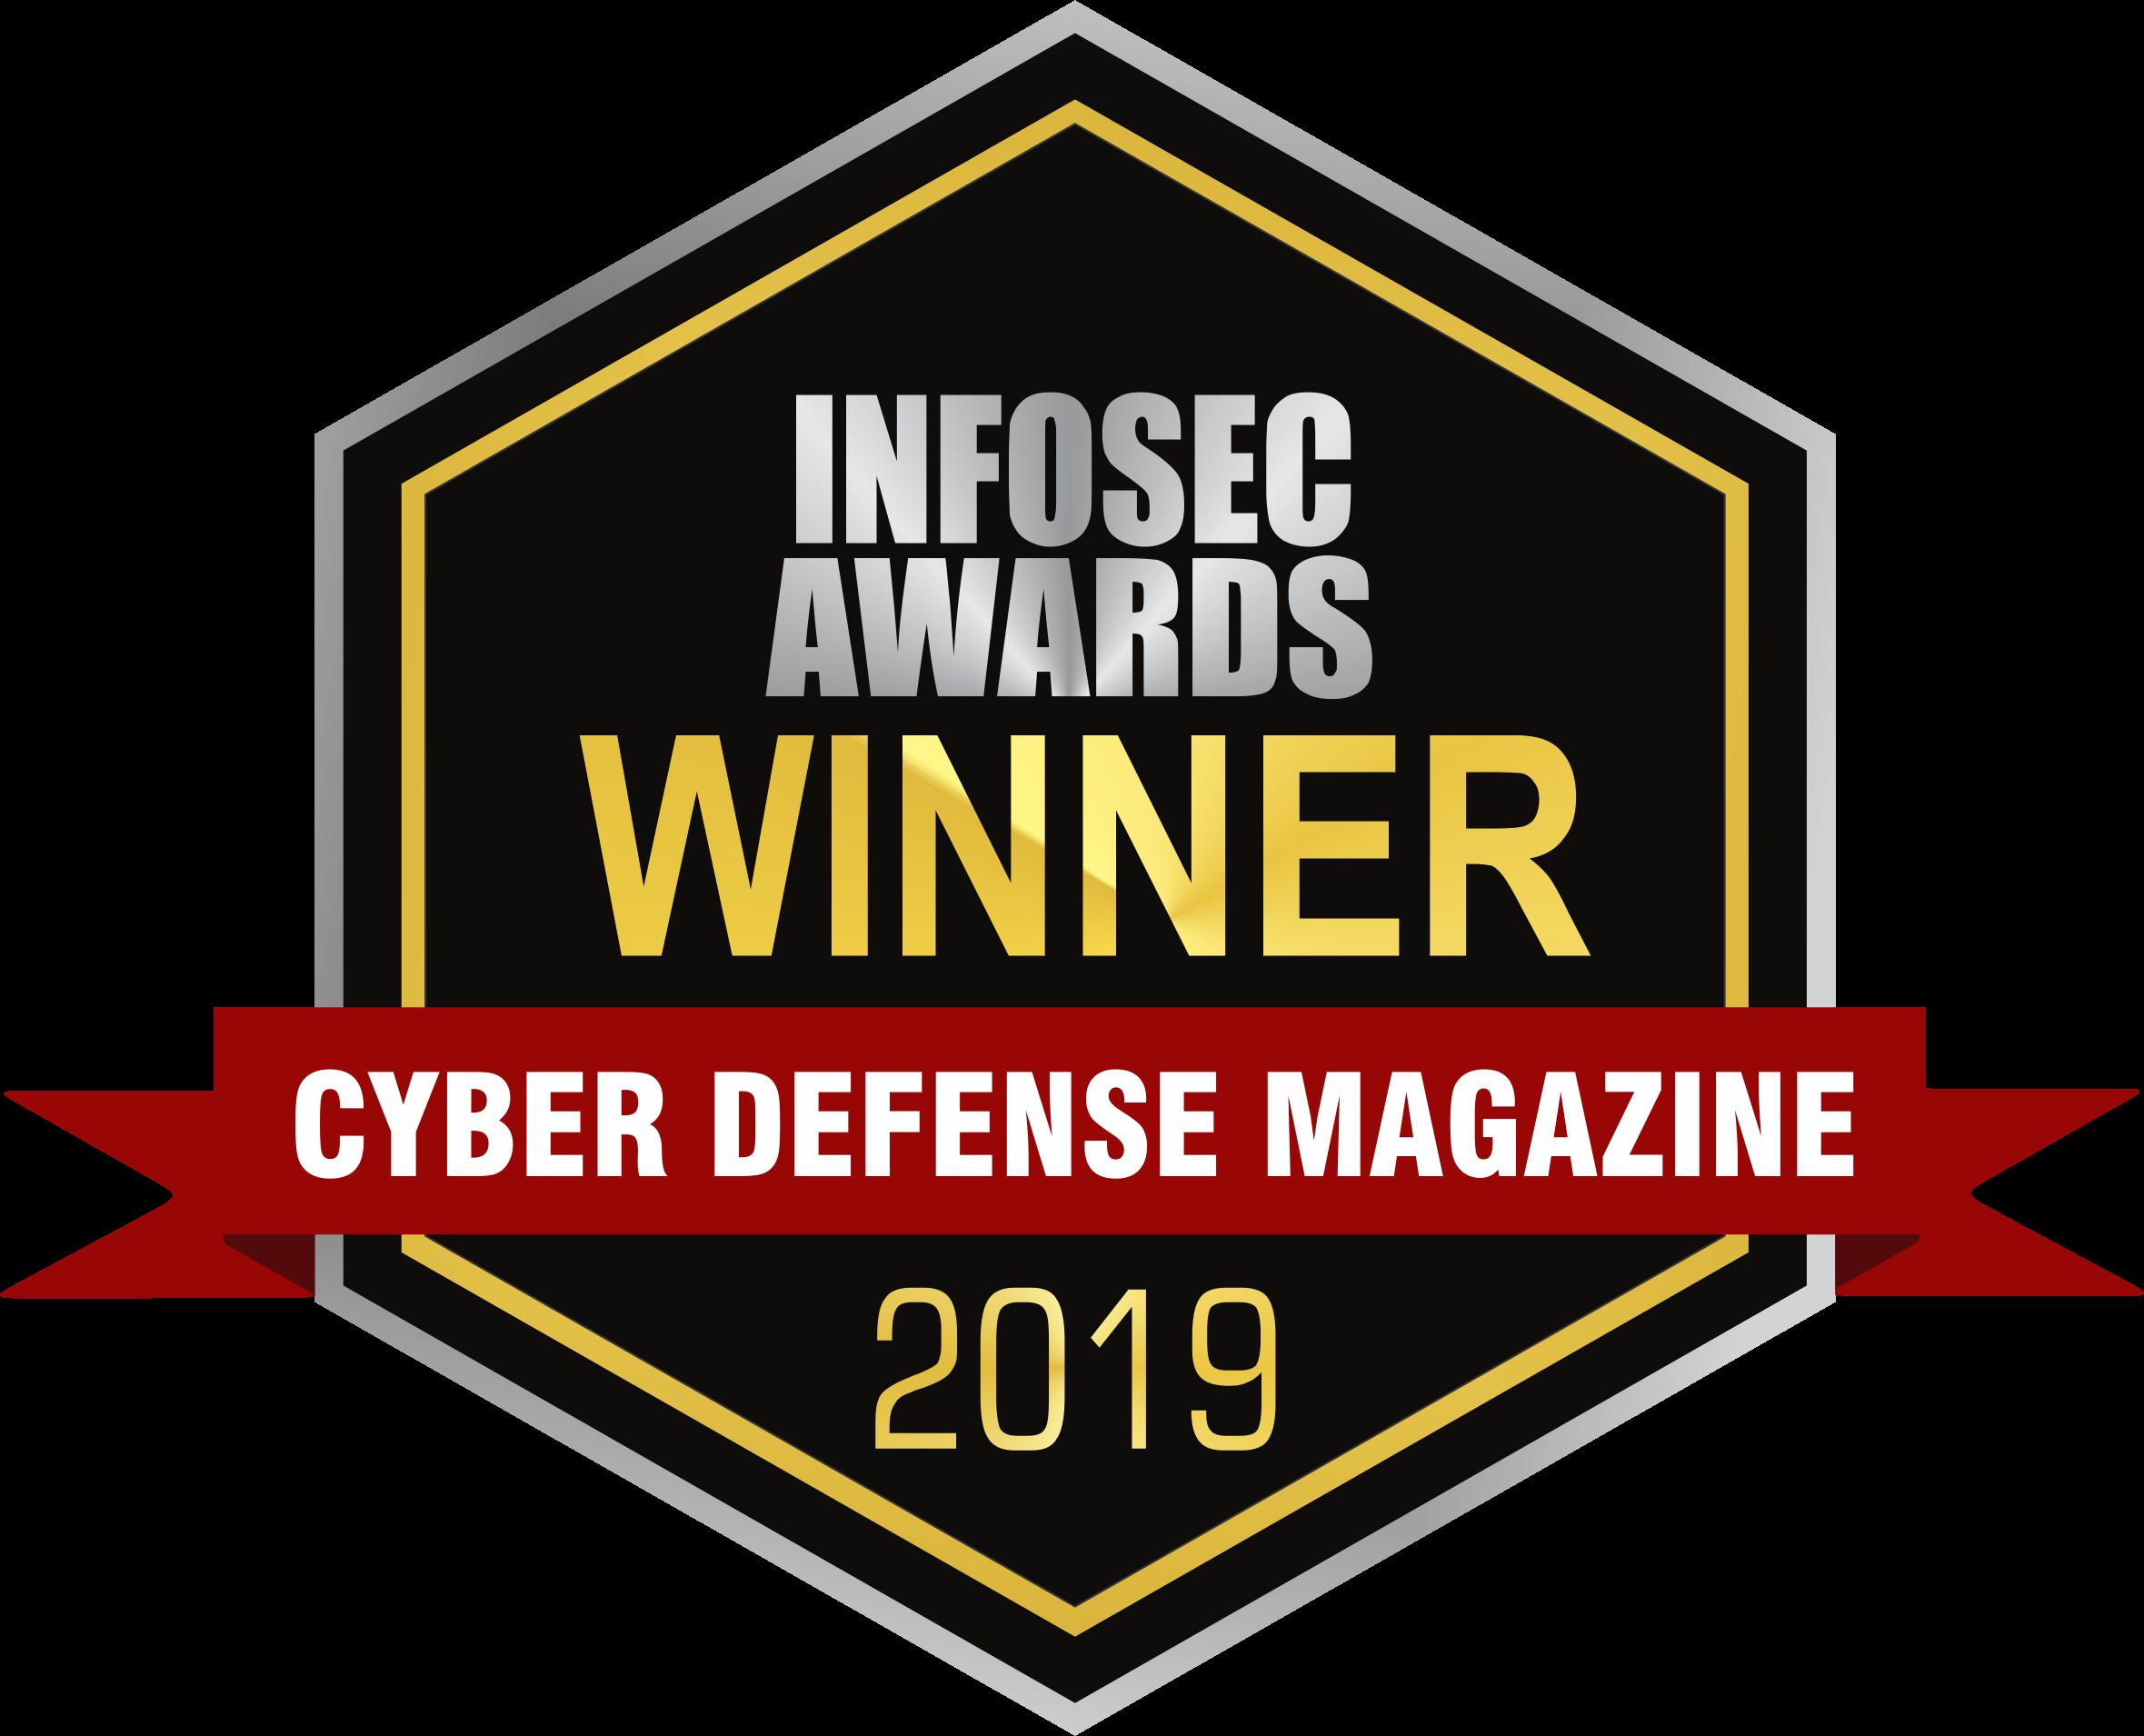 Cyber defense Magazine Infosec Award Winner 2019